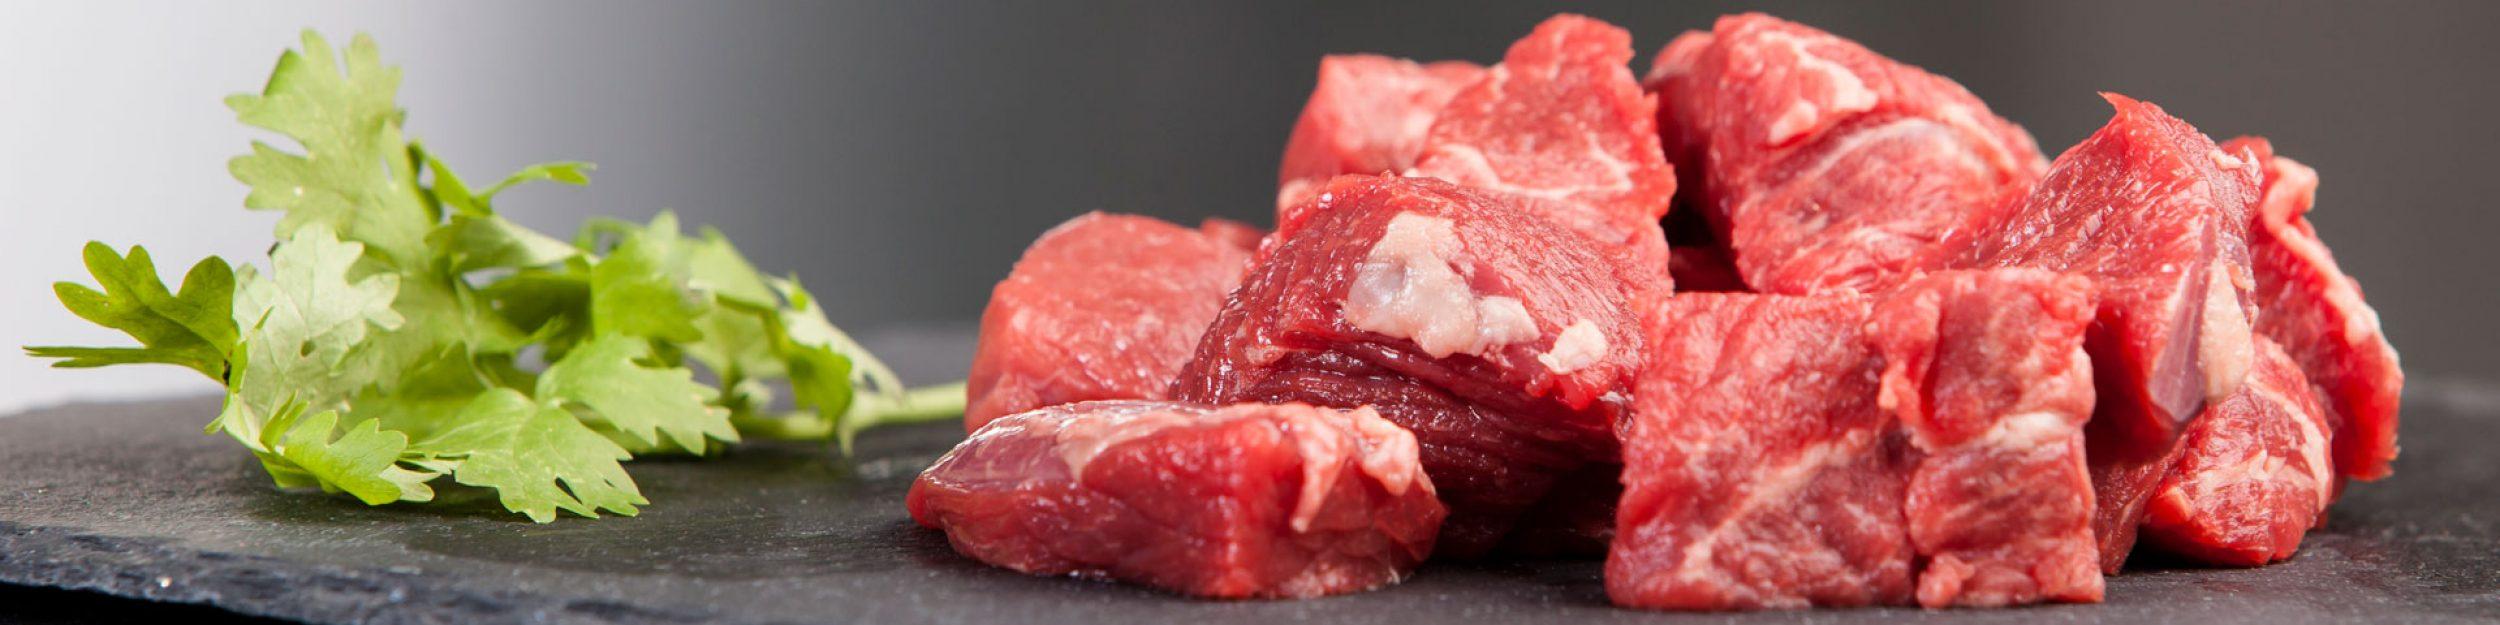 La Carne de Cipriano